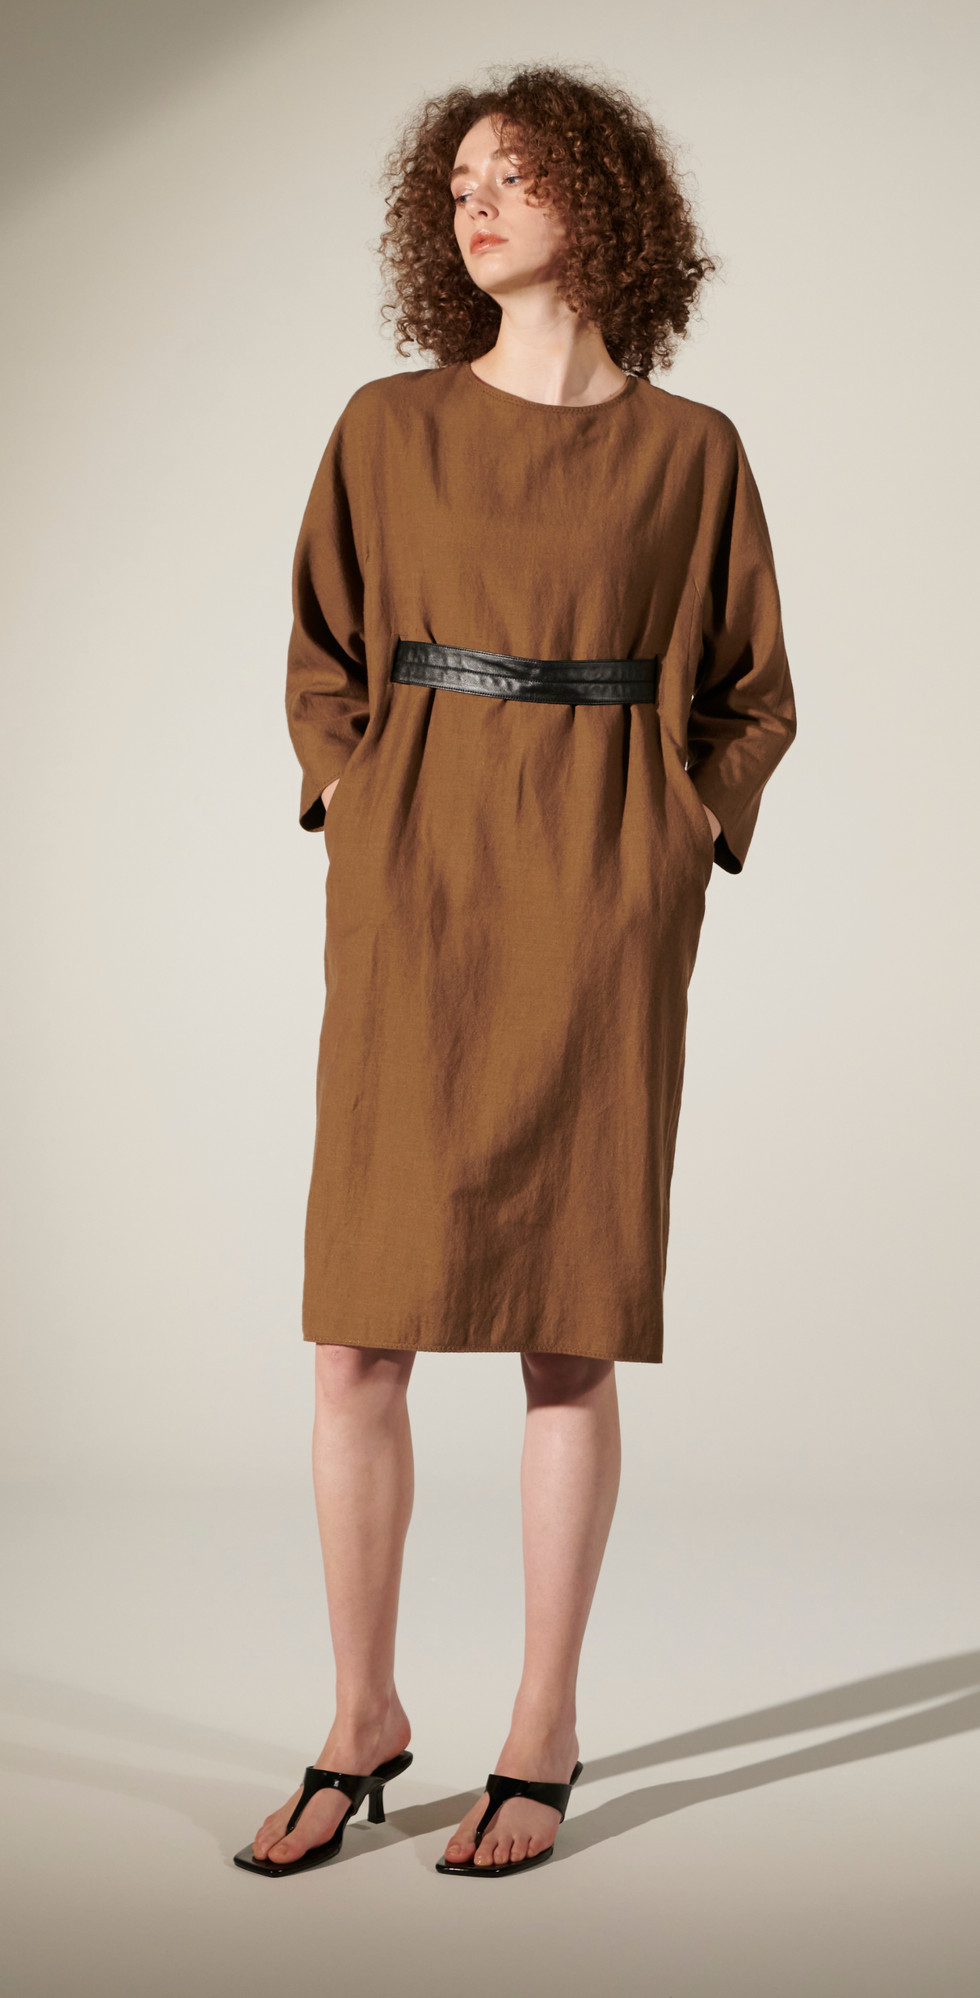 dress R8O-171-26736